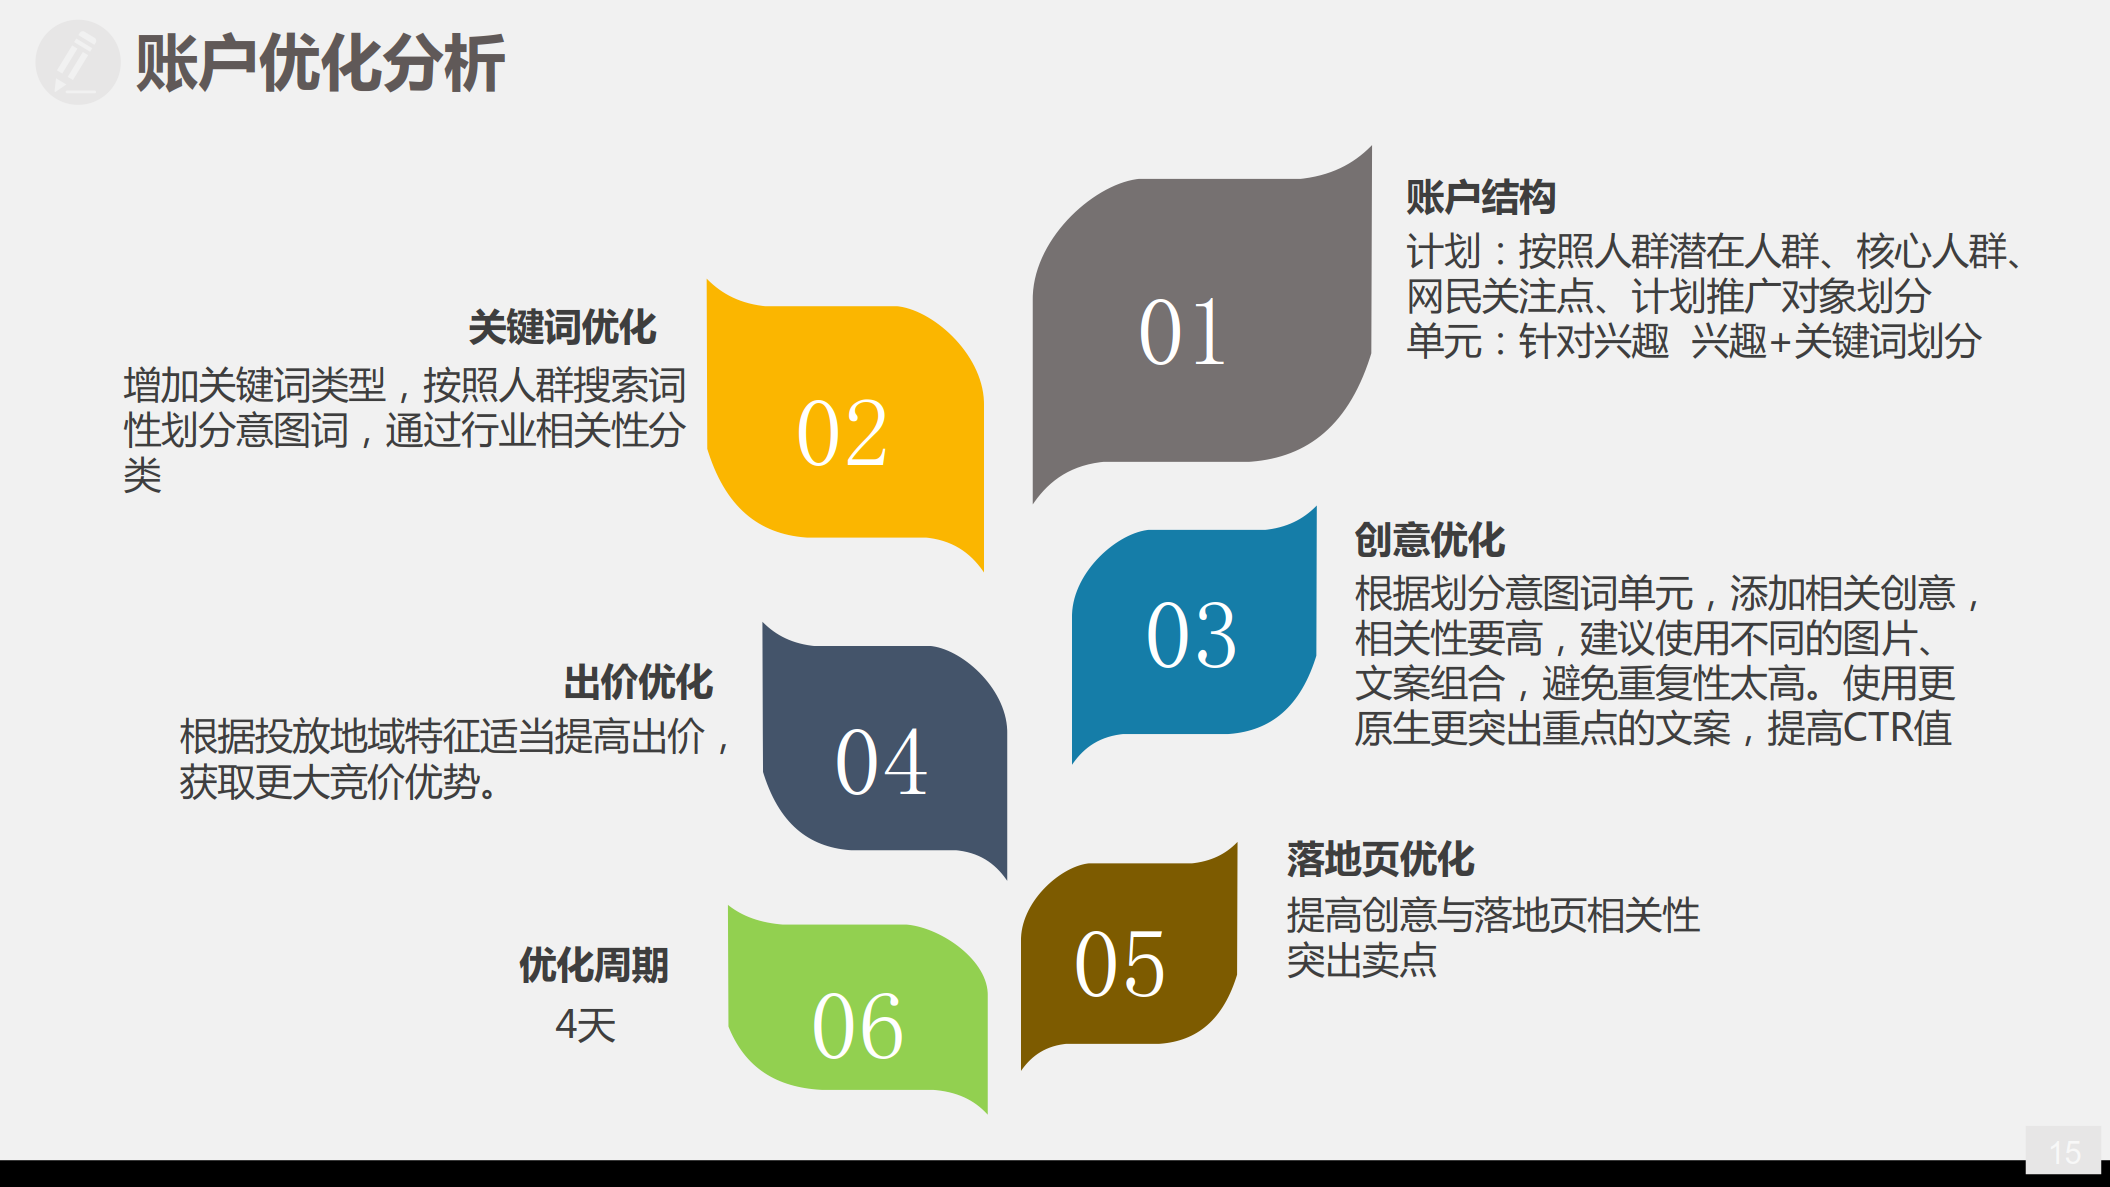 F1+vbj村小爱+软件游戏+张洁0608_15.png